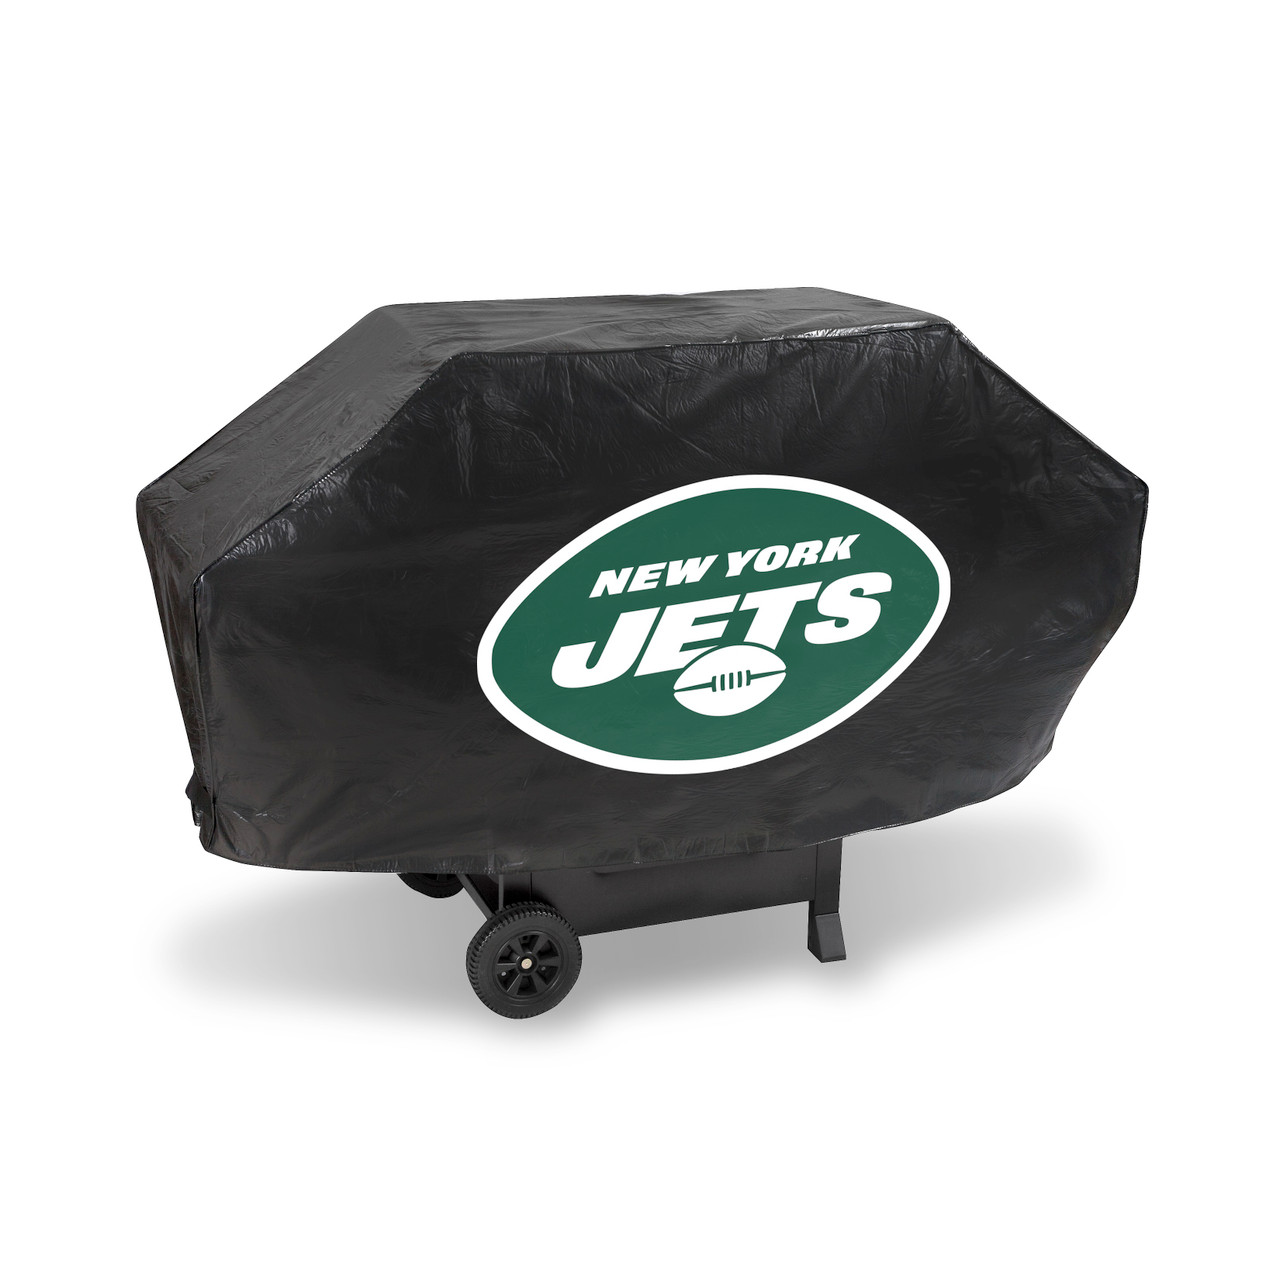 New York Jets Grill Cover Deluxe Alternate Design